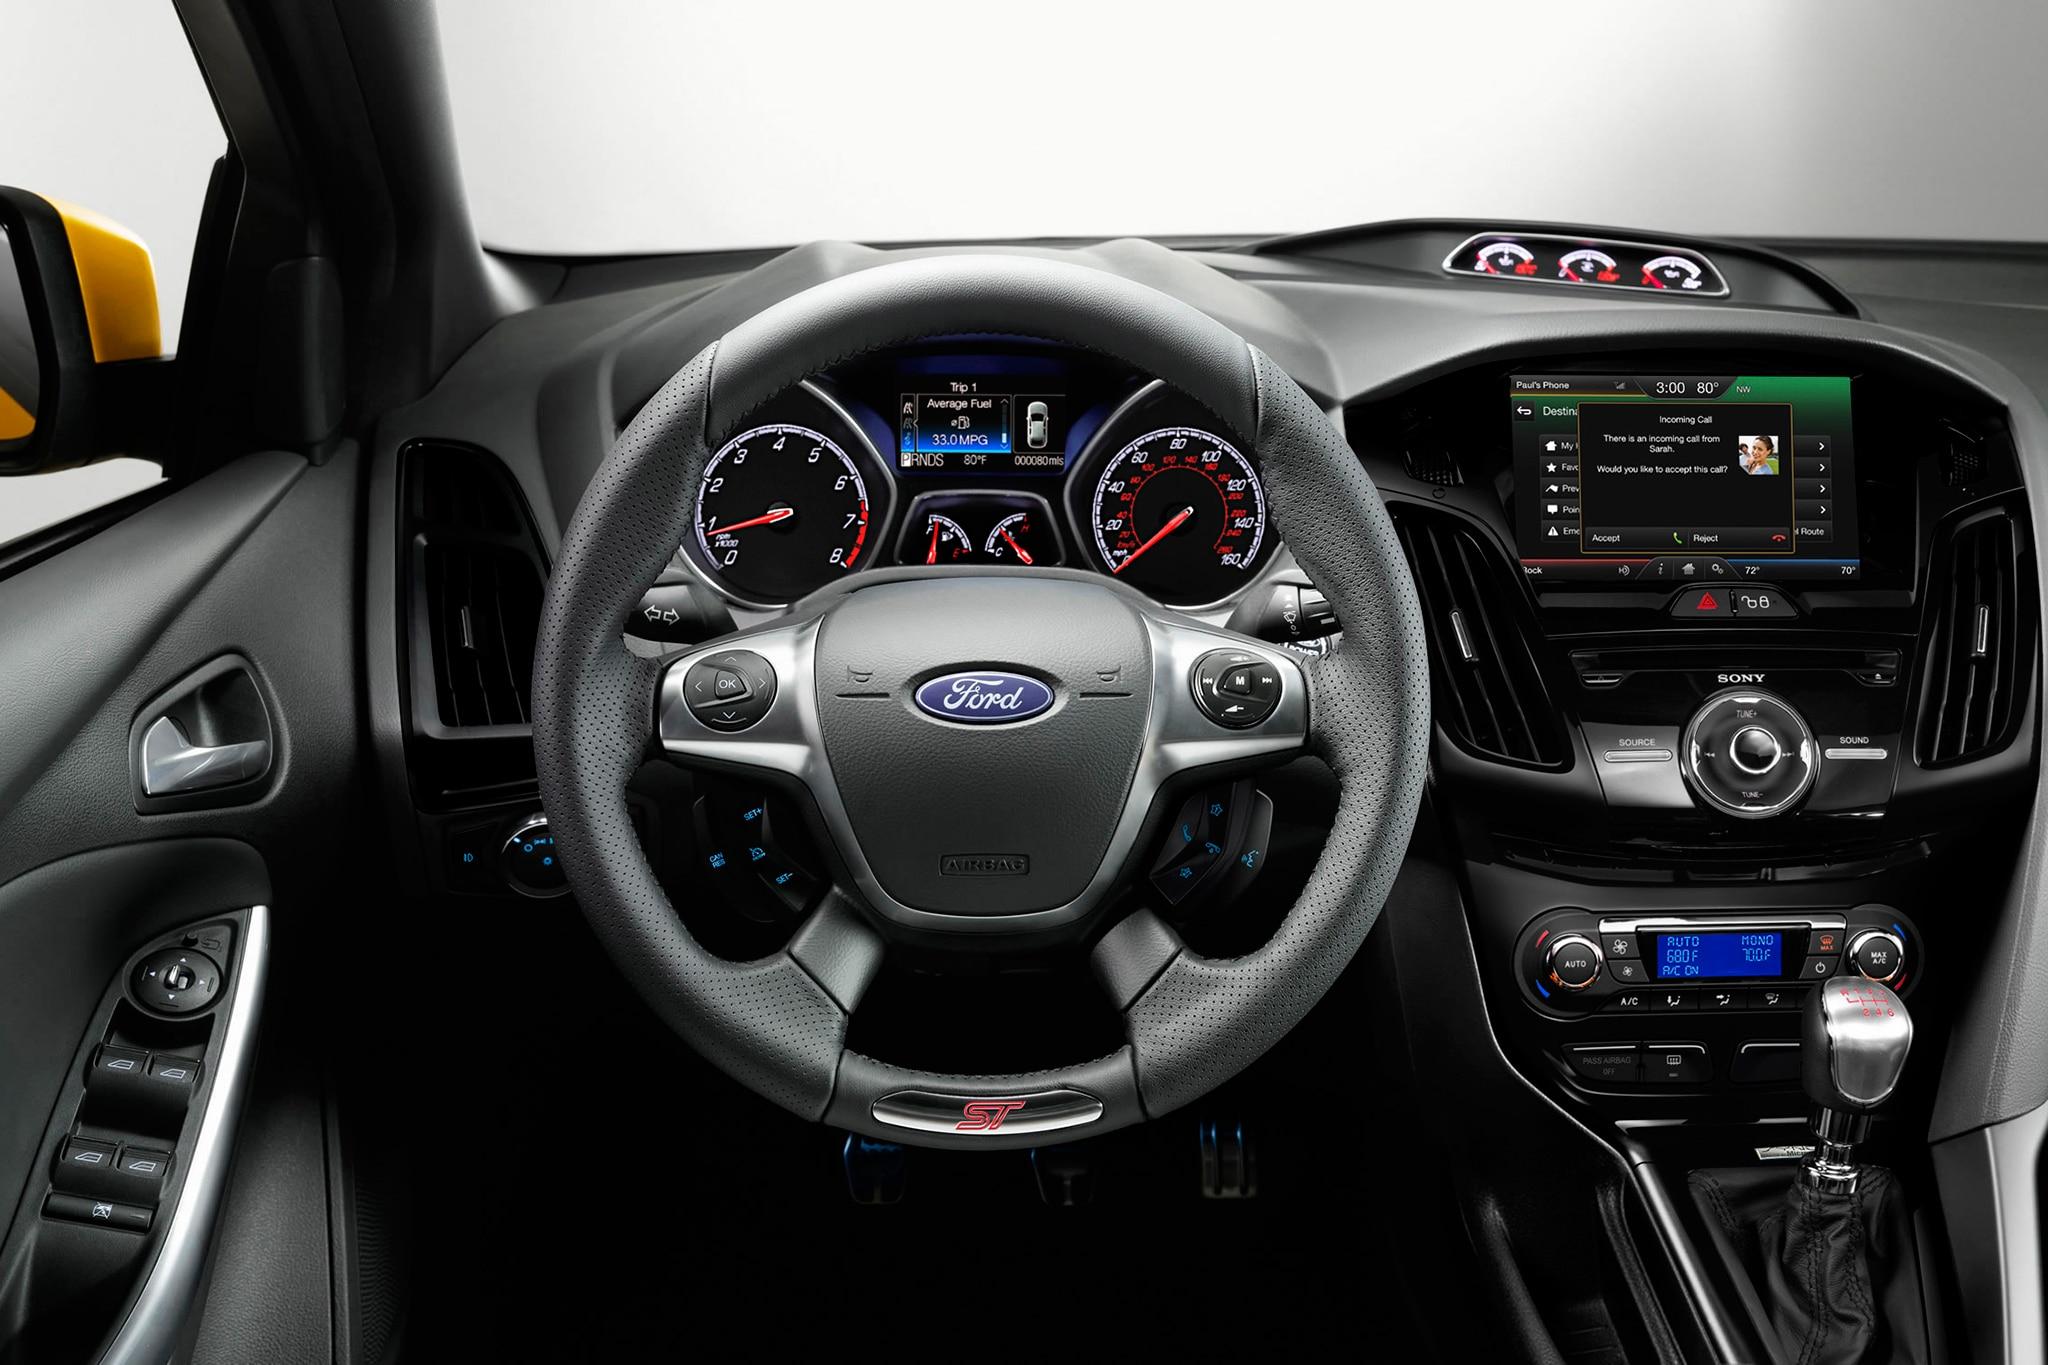 Image Of Ford Focus St Dash Kit Metra 2012 2014 995827b Suspension Airlift 1317 Air 78543 78643 Ap